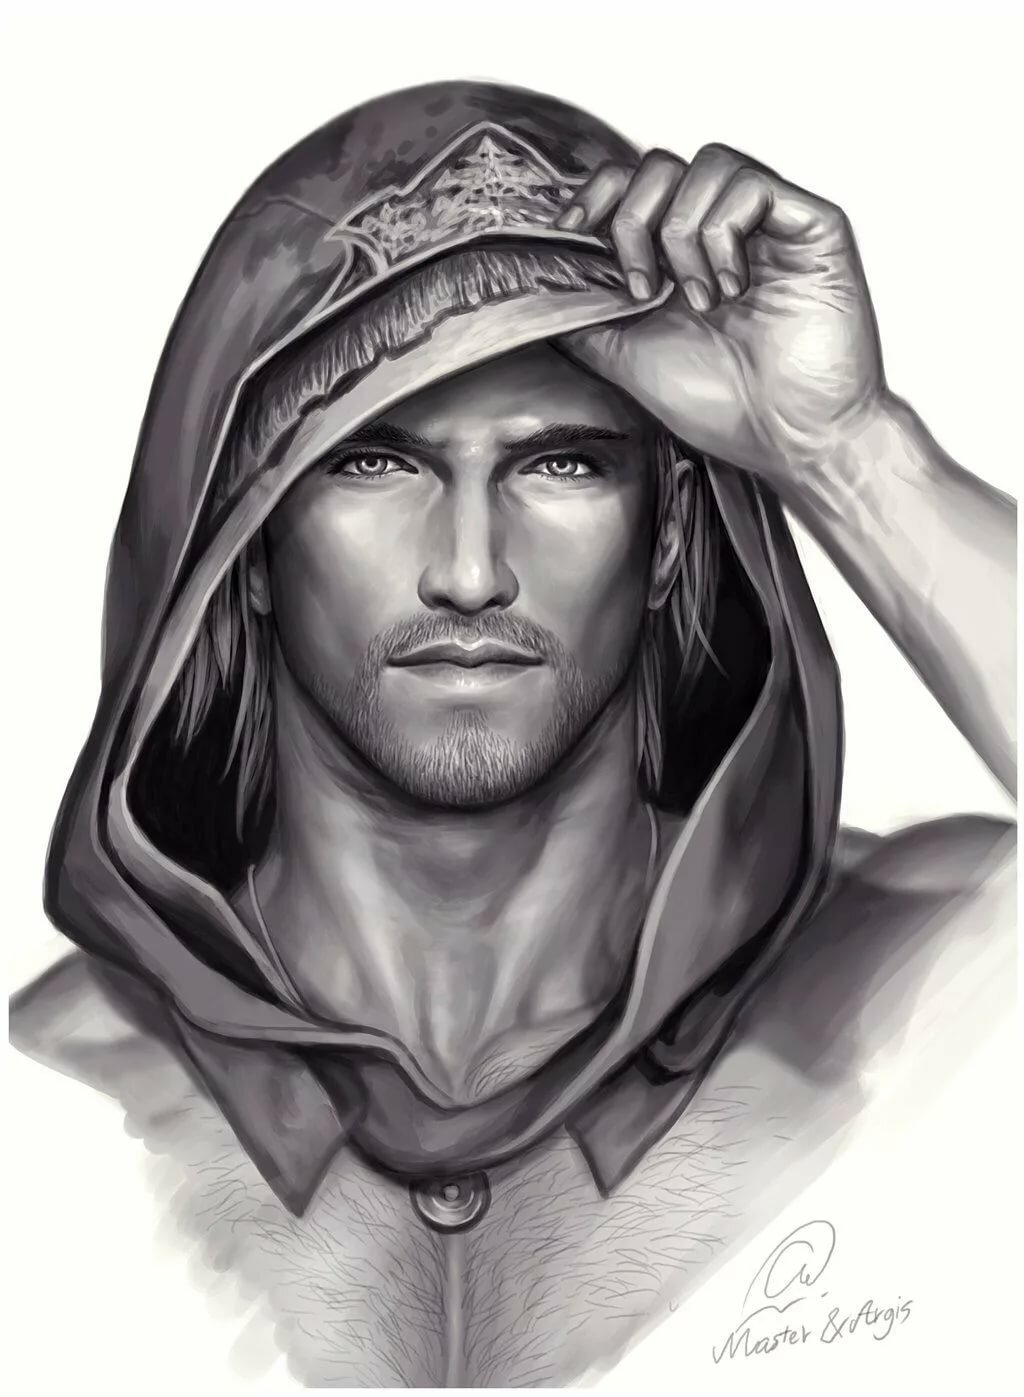 Рисунок на аватарку для мужчин